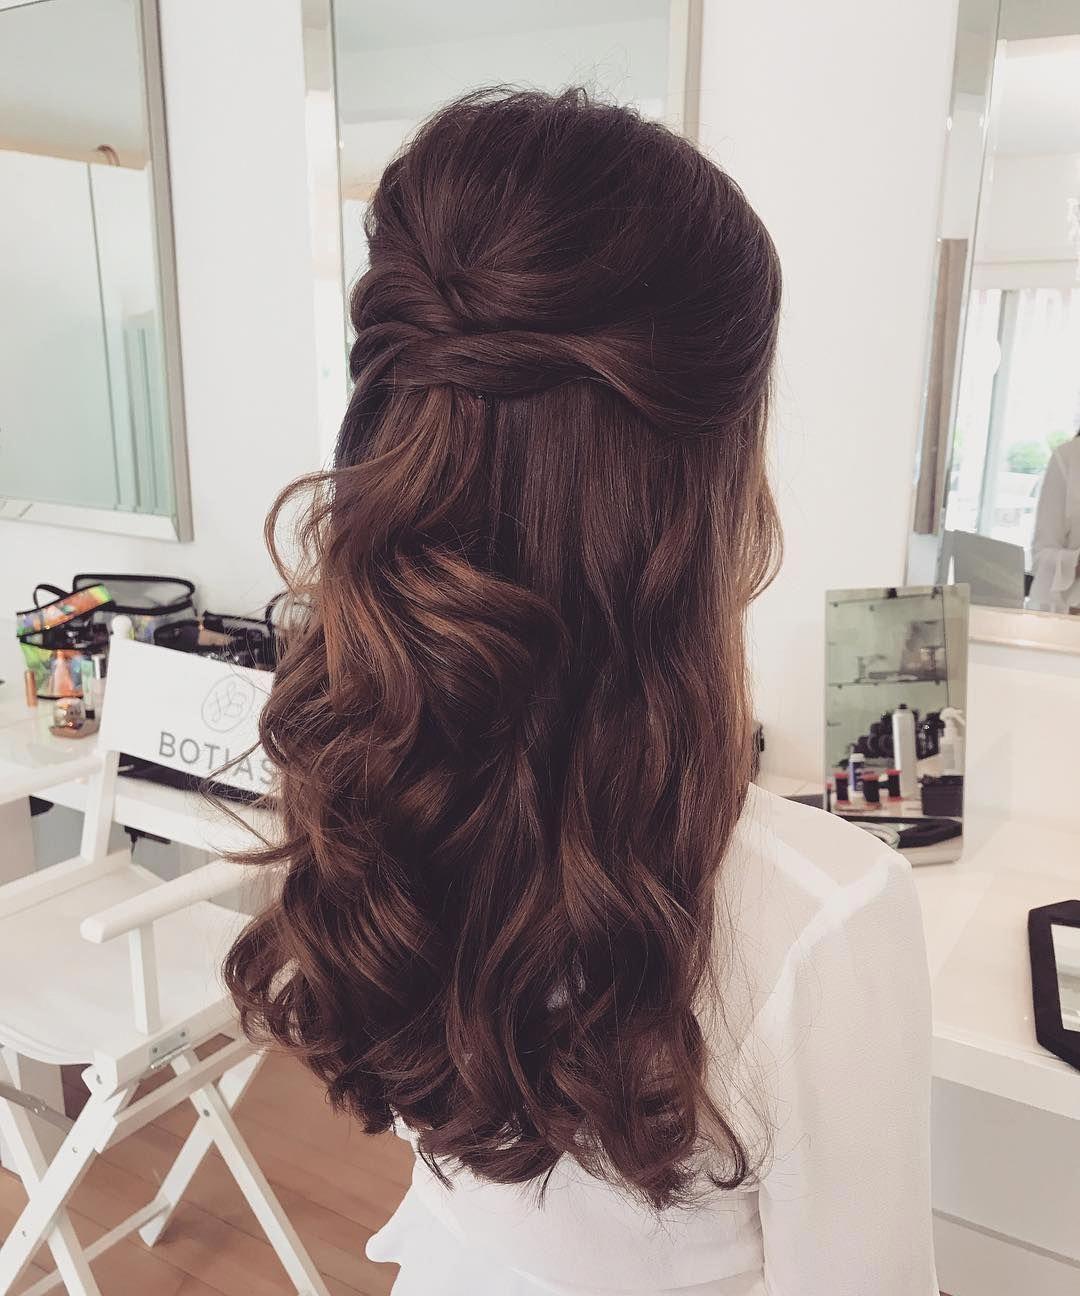 25 Half Up Half Down Wedding Hairstyles Every Bride Will Love Wedding Hair Half Elegant Wedding Hair Wedding Hairstyles For Long Hair